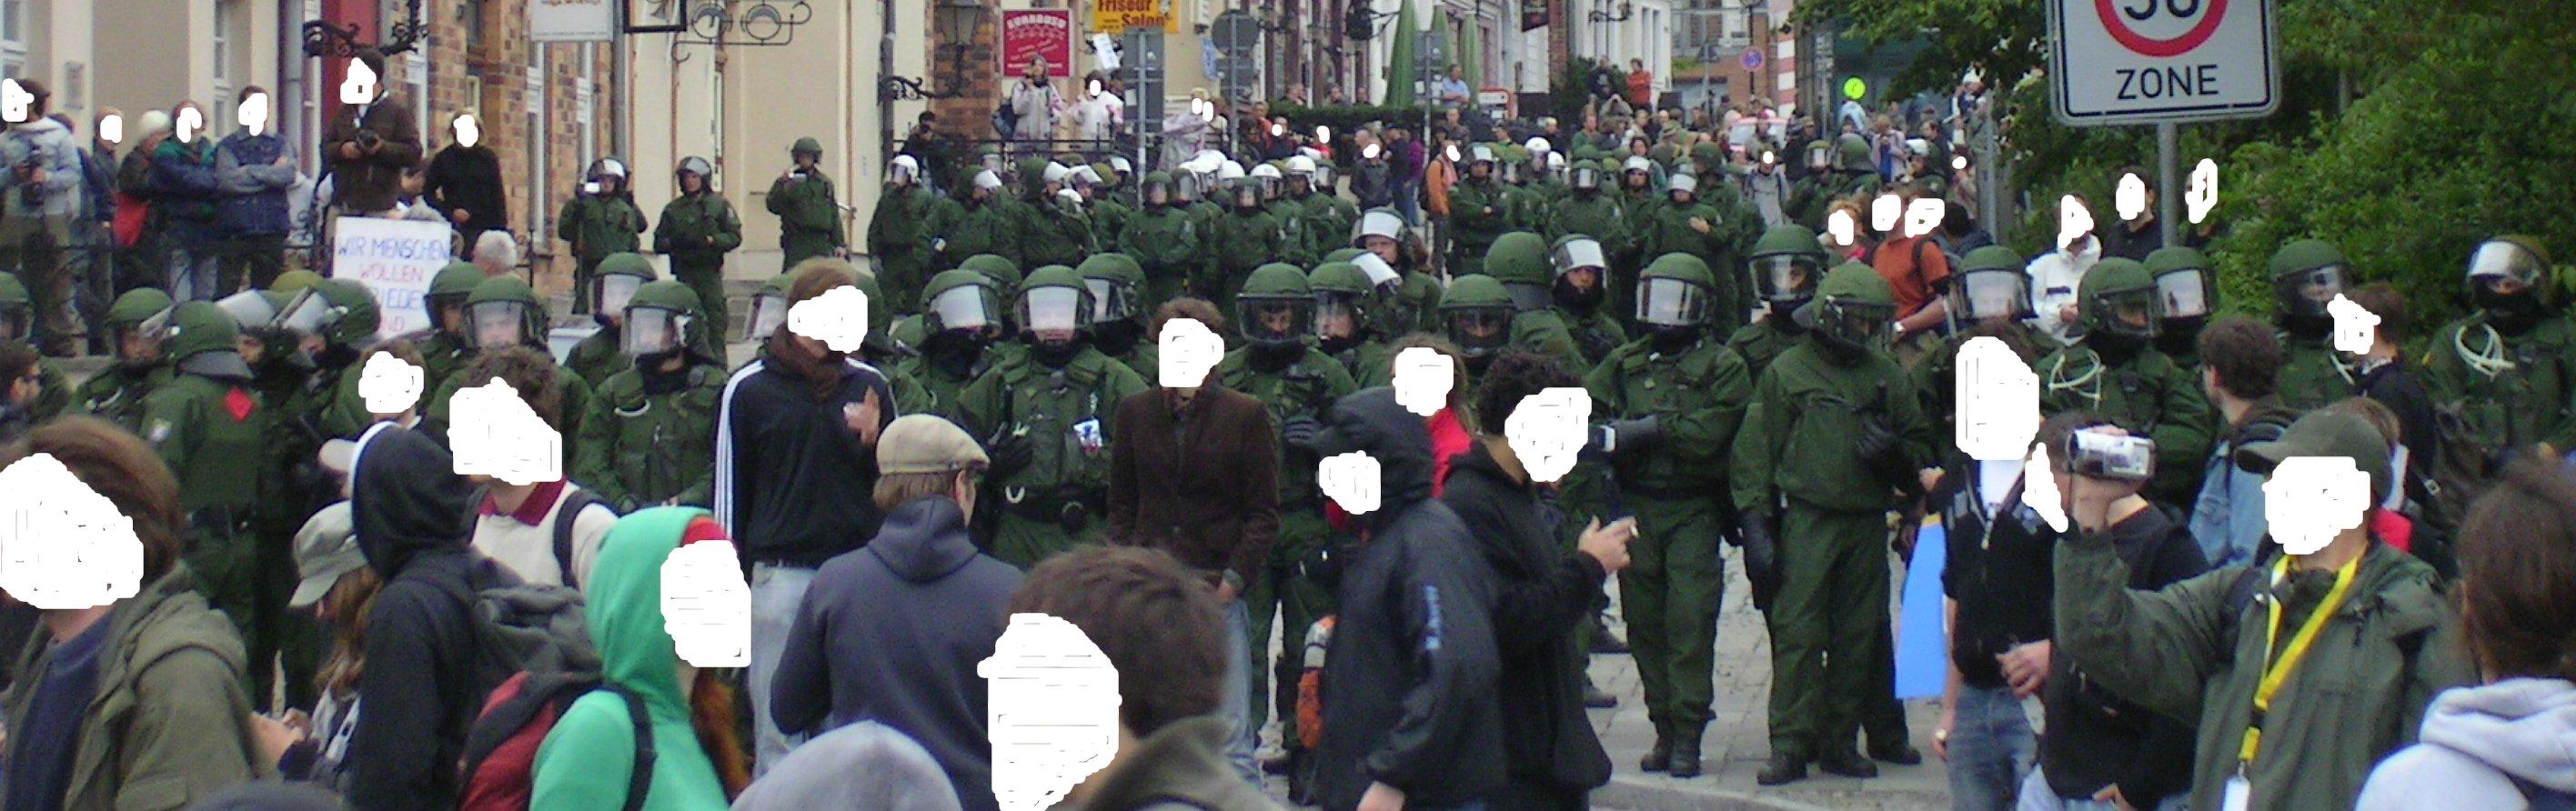 2.6.07 polizeirückzug demo rostock